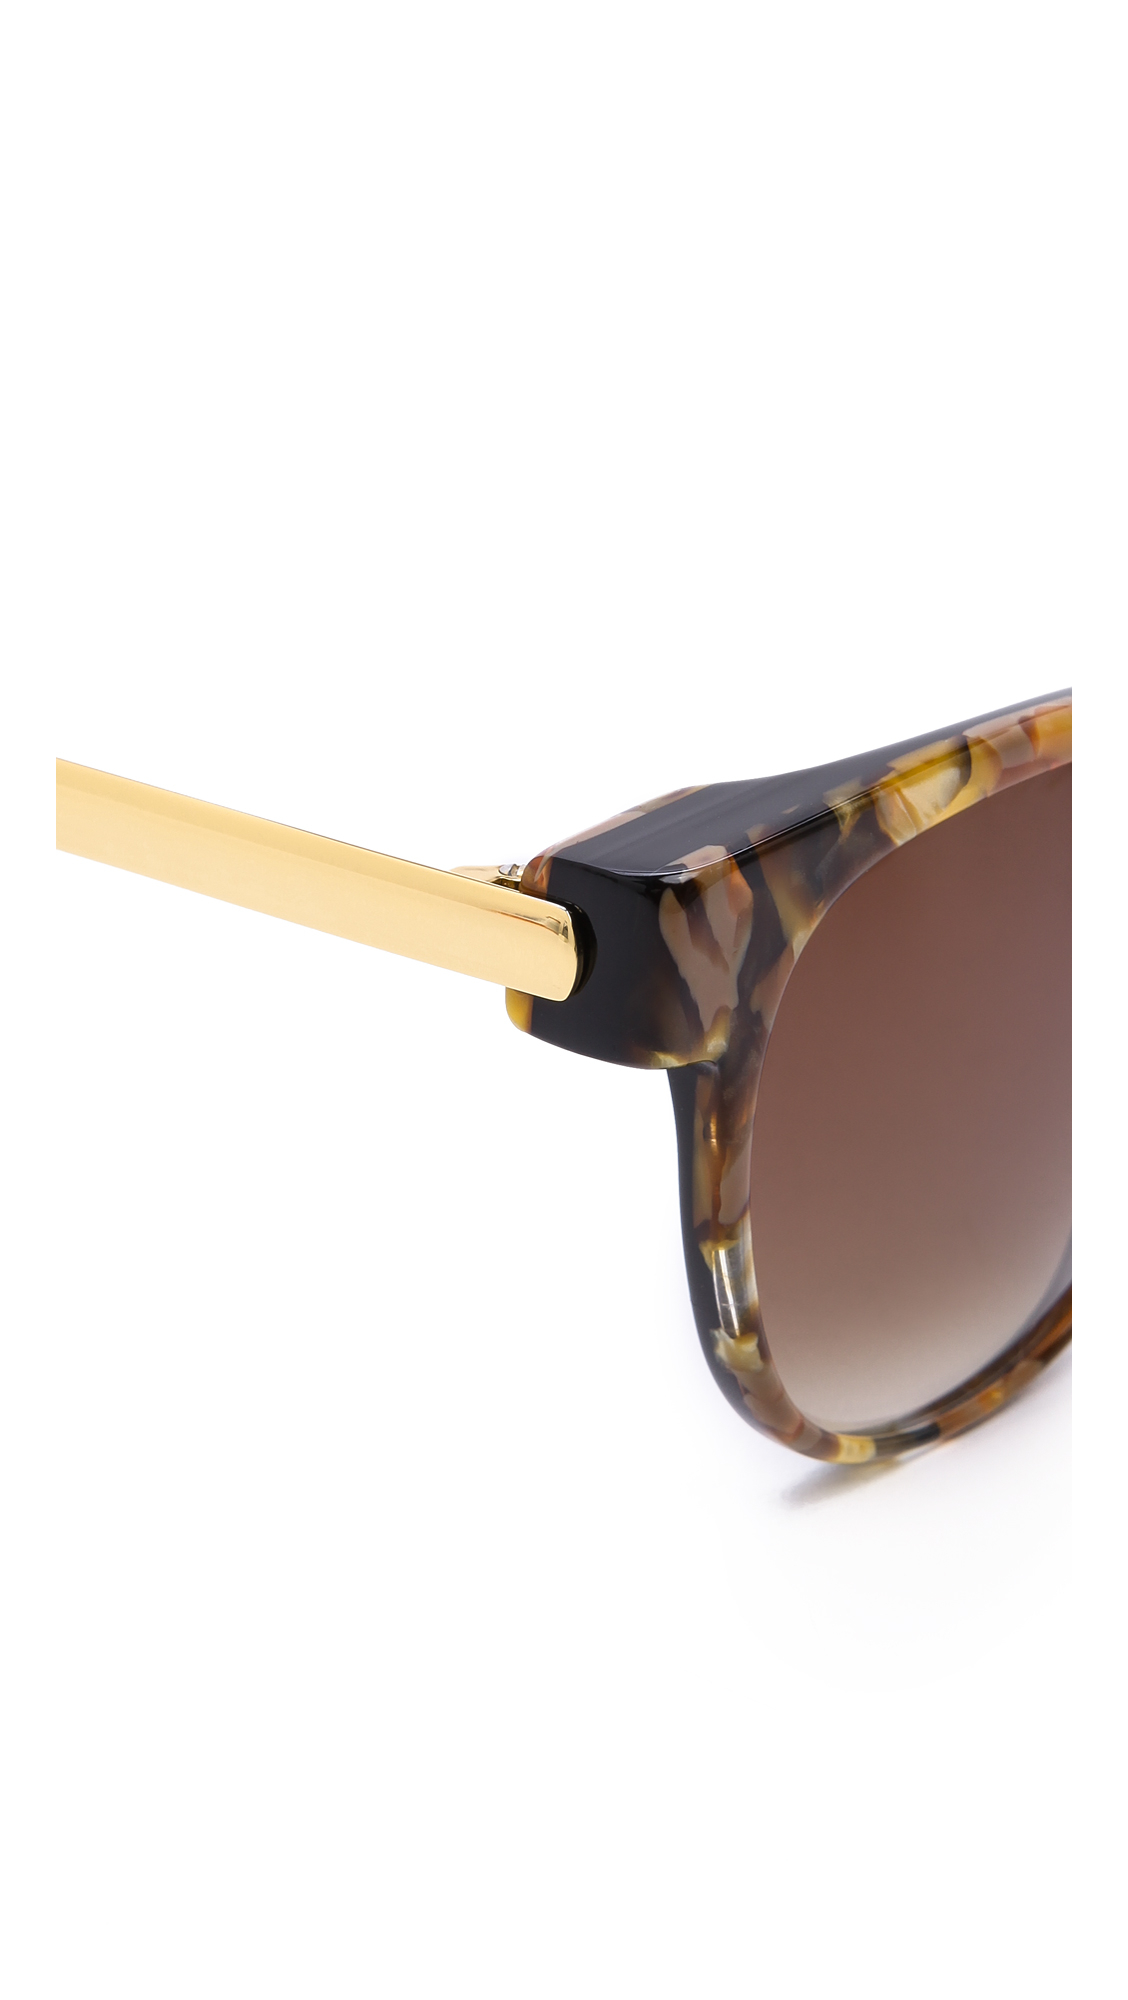 Thierry Lasry Perfidy Sunglasses in Marble Orange/Brown (Brown)